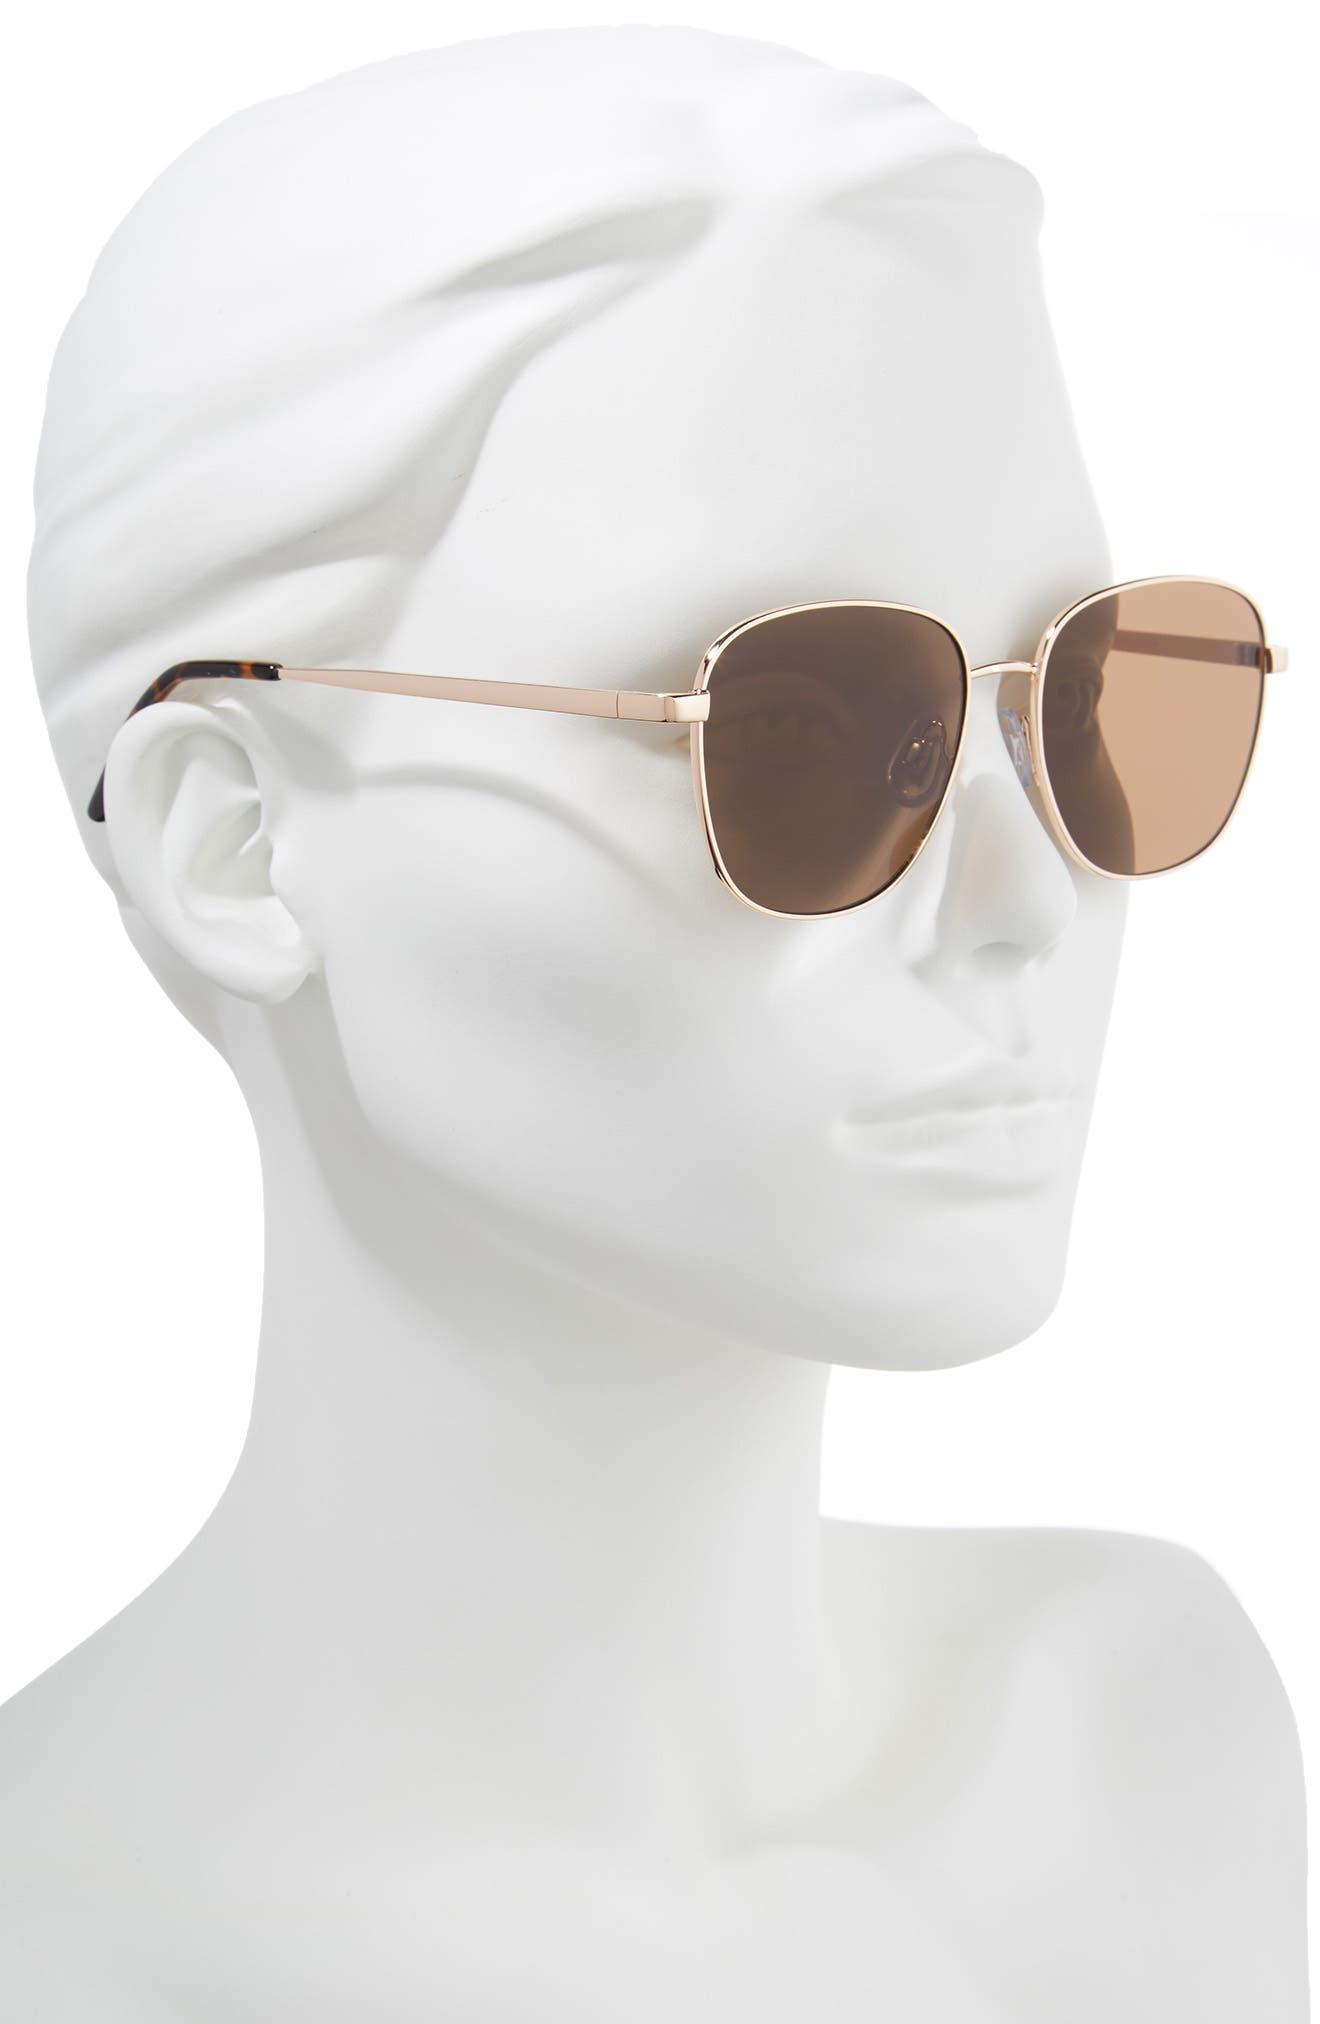 53mm Square Sunglasses,                             Alternate thumbnail 2, color,                             710